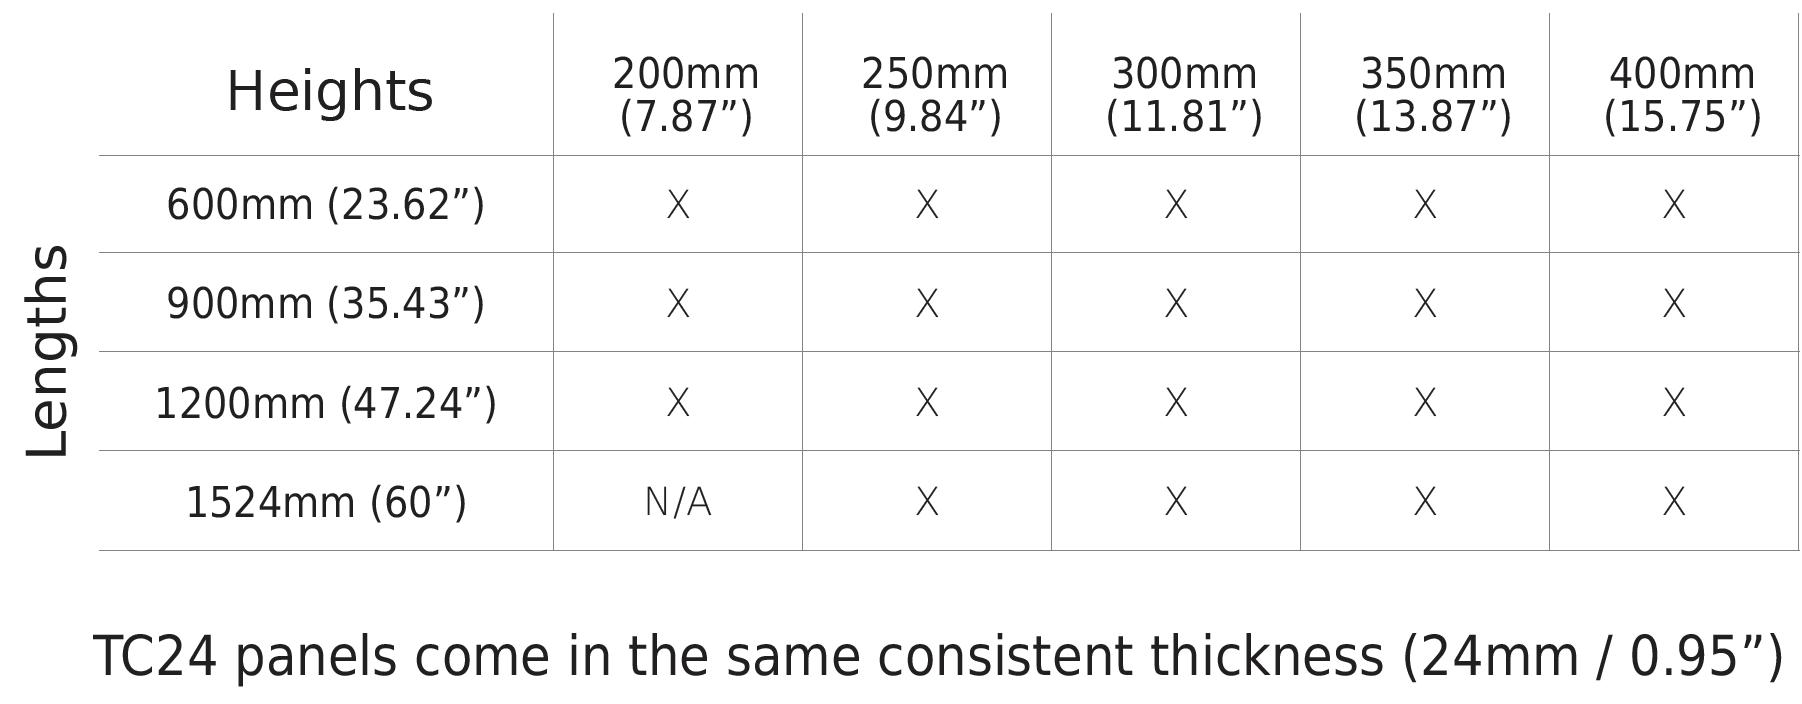 Terra5 TC24 Terracotta Rainscreen Cladding Tile Size Chart